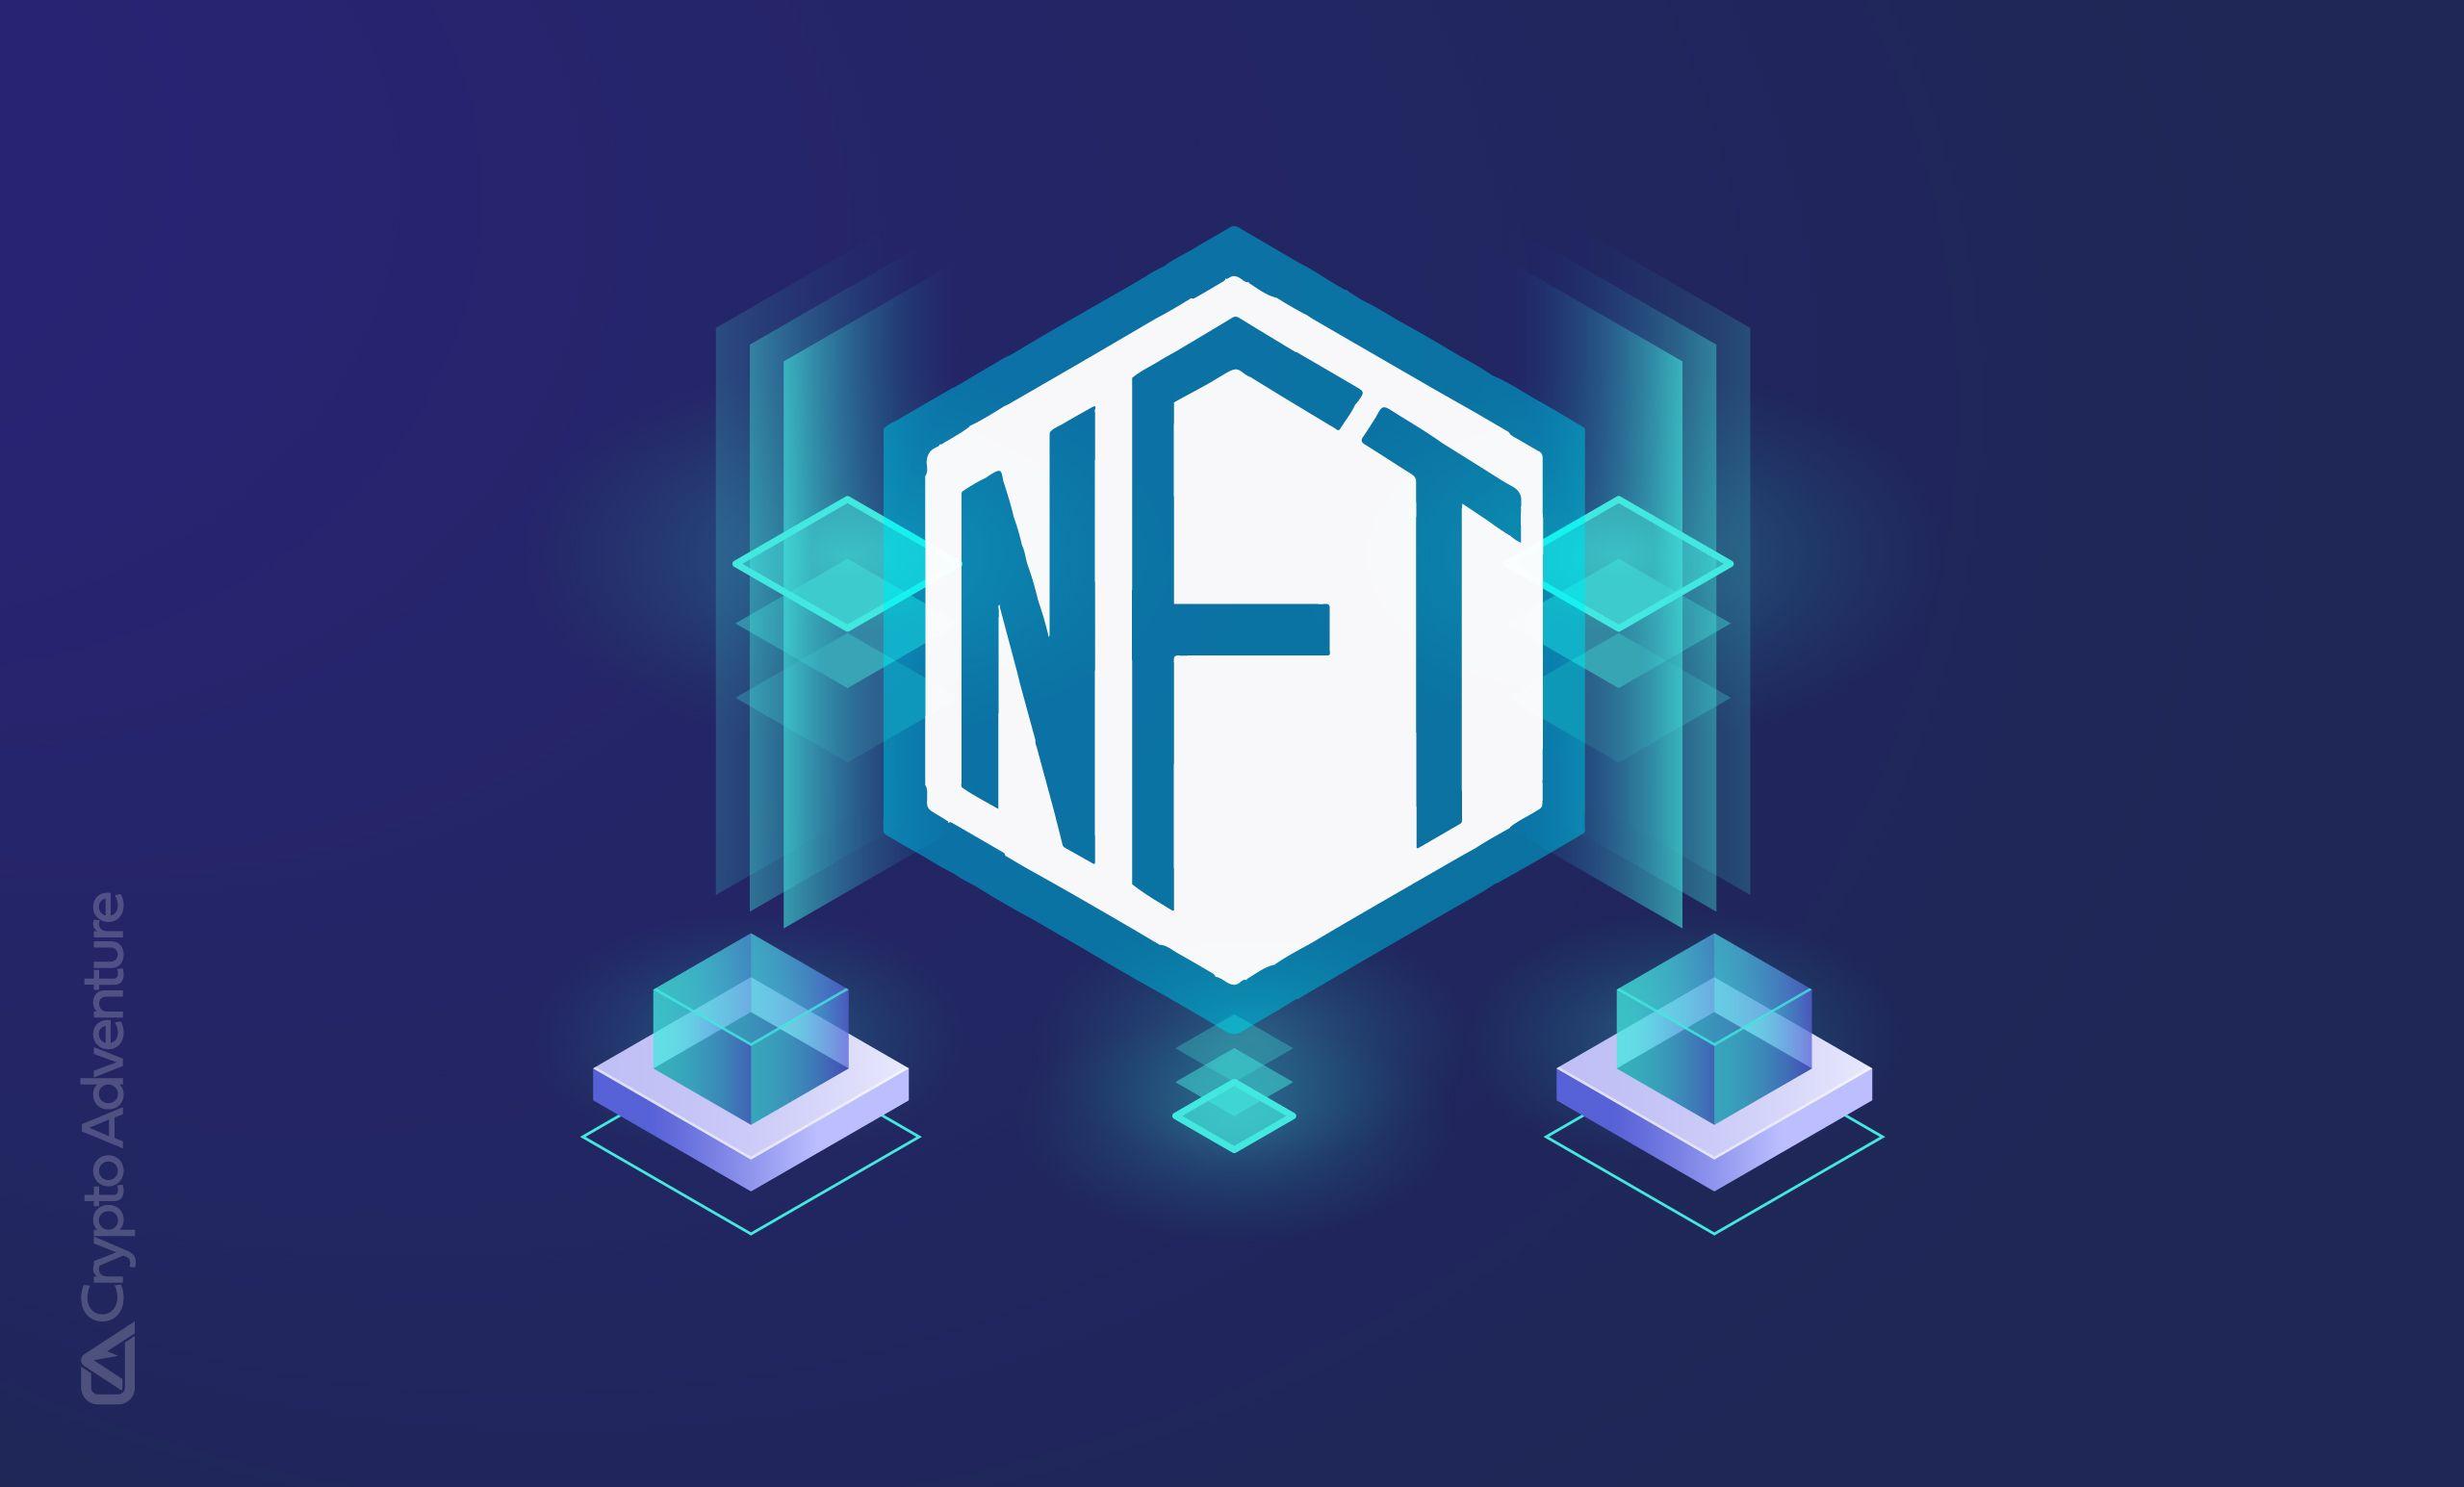 /nft-projects-of-the-day-rarible-vs-falcon-vs-async-vs-ador-vs-superrare-vs-cryptopunks-ss3l33e7 feature image